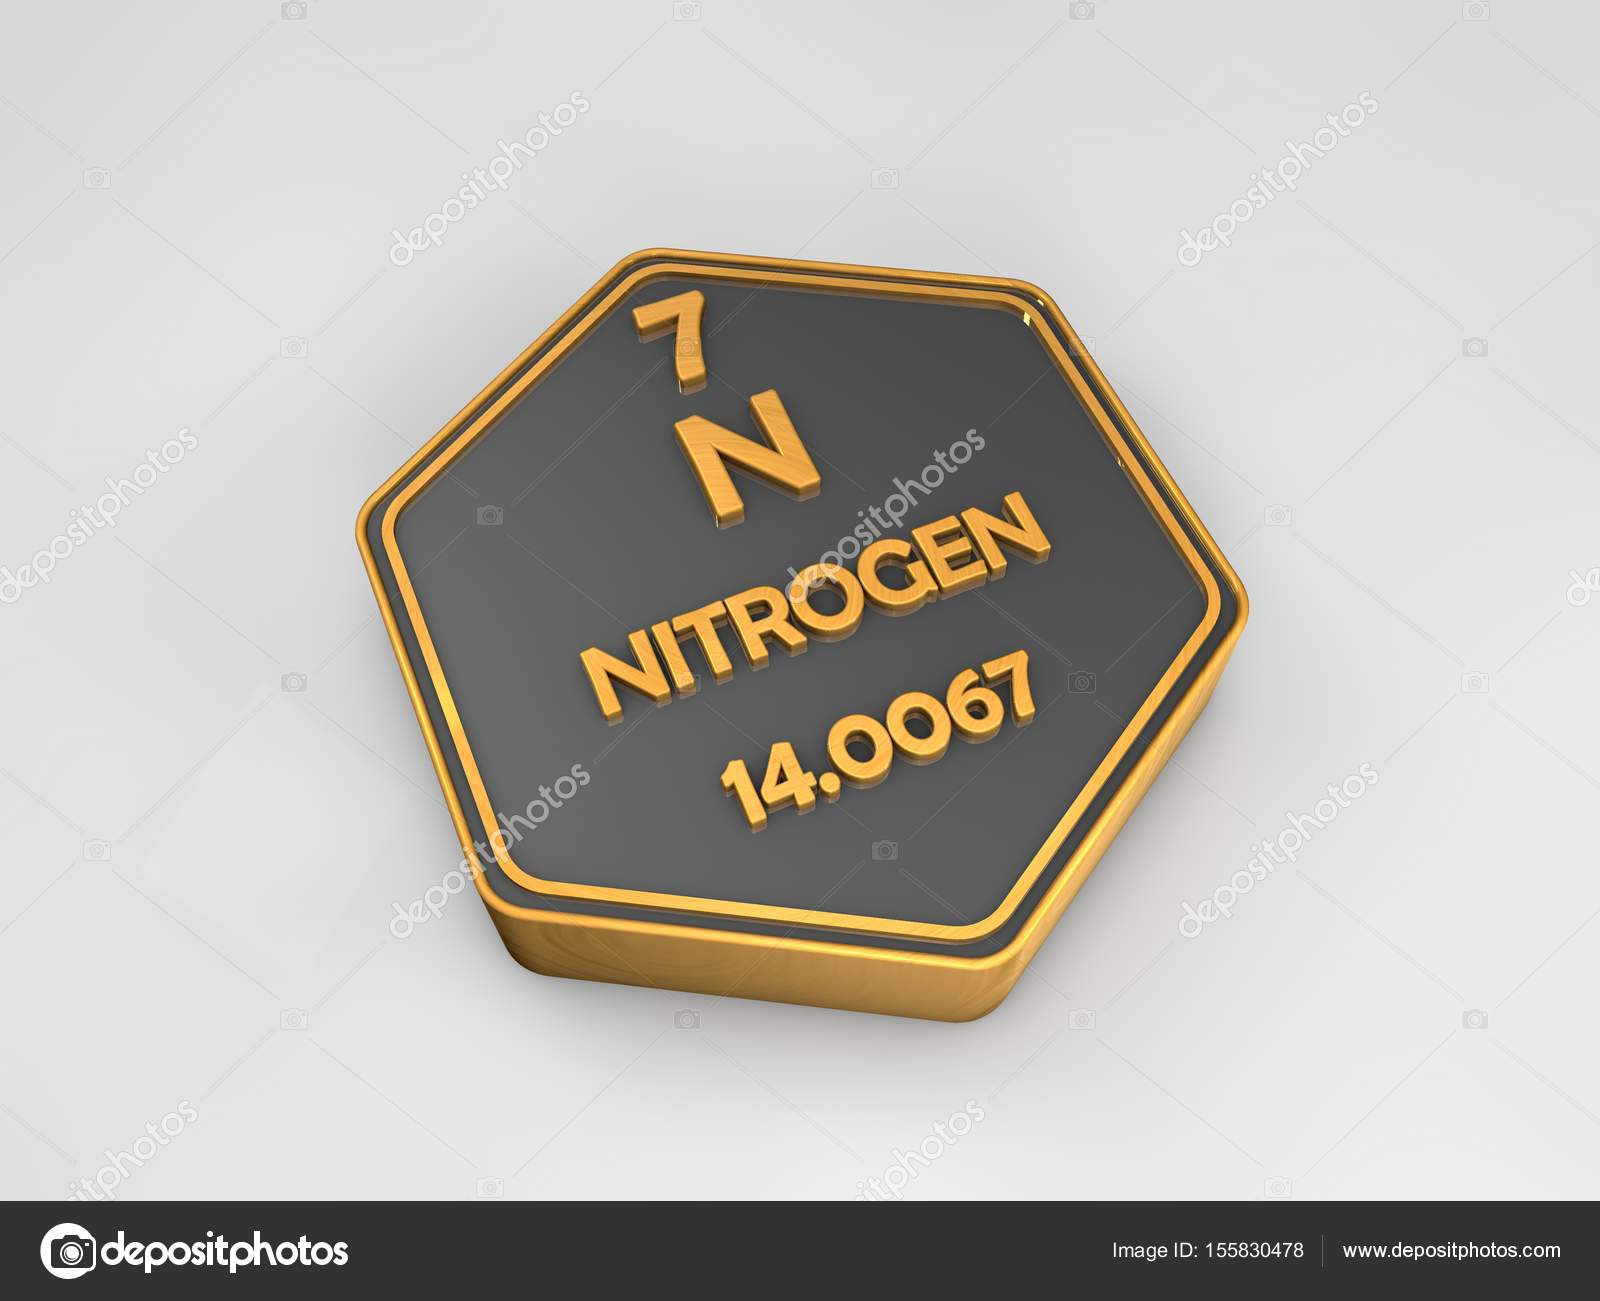 Ilustracin 3d de forma hexagonal de tabla peridica de elementos ilustracin 3d de forma hexagonal de tabla peridica de elementos qumicos de nitrgeno n urtaz Images